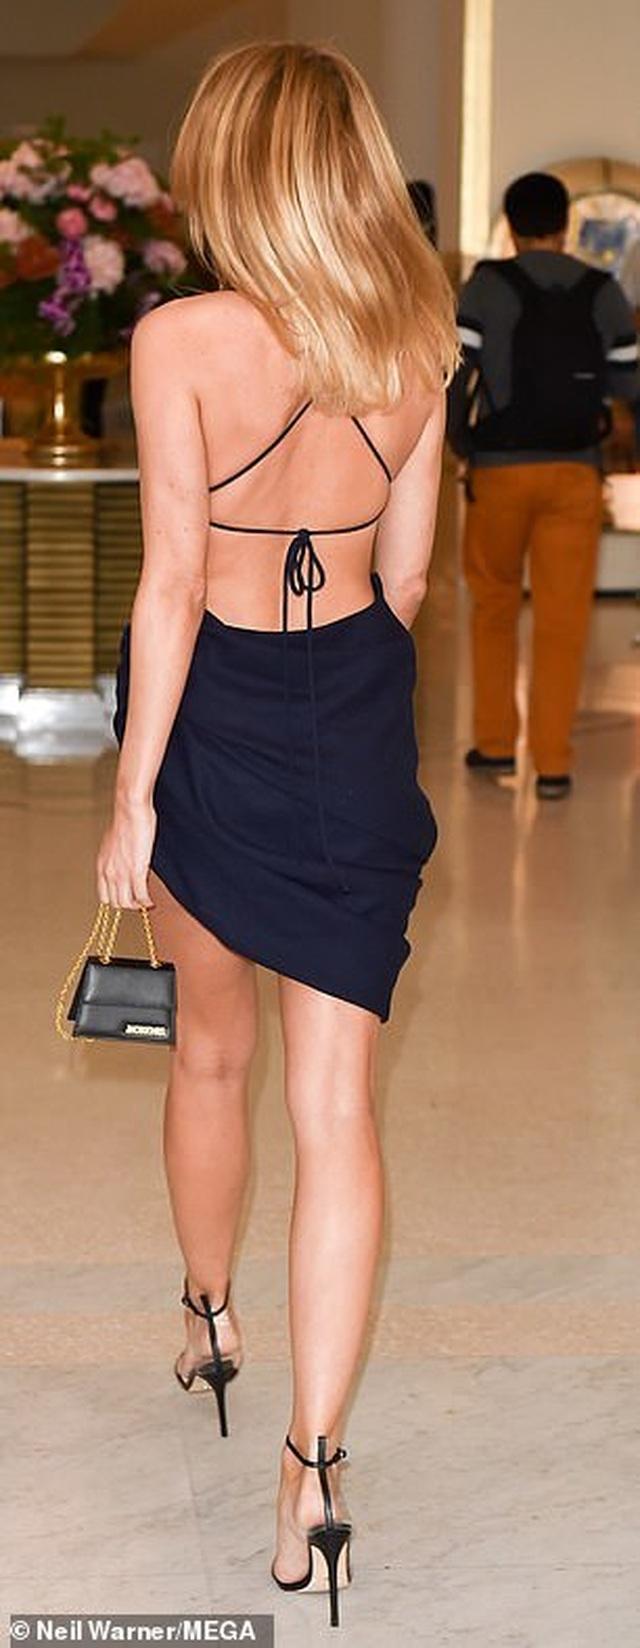 Kimberley Garner sexy với váy xẻ bạo - 4